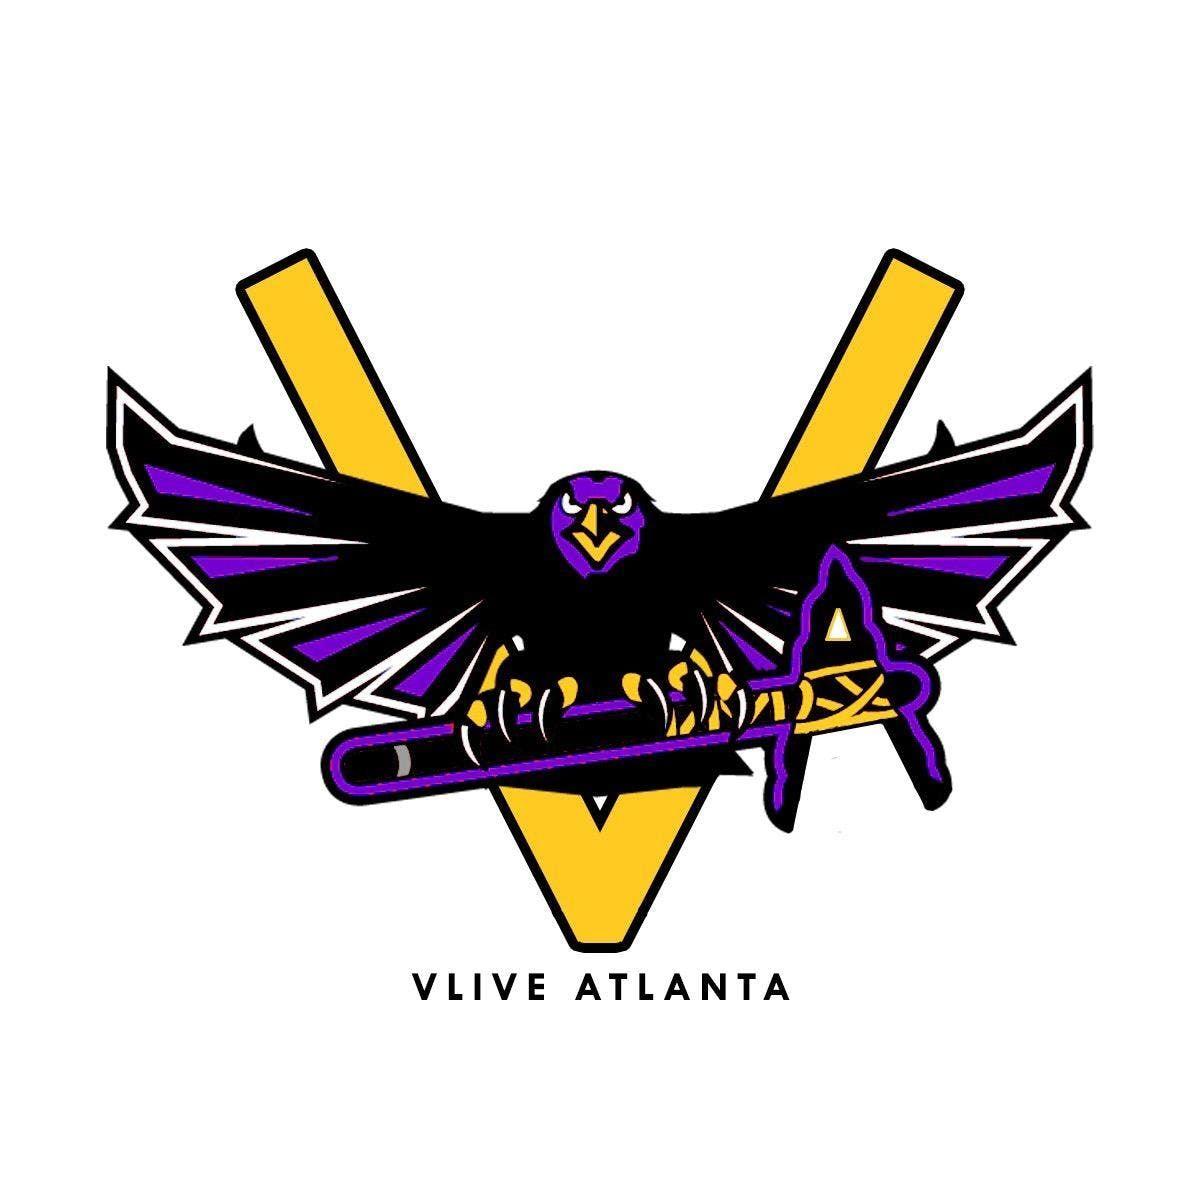 VLive Atlanta at 1271 Marietta Blvd NW, Atlanta